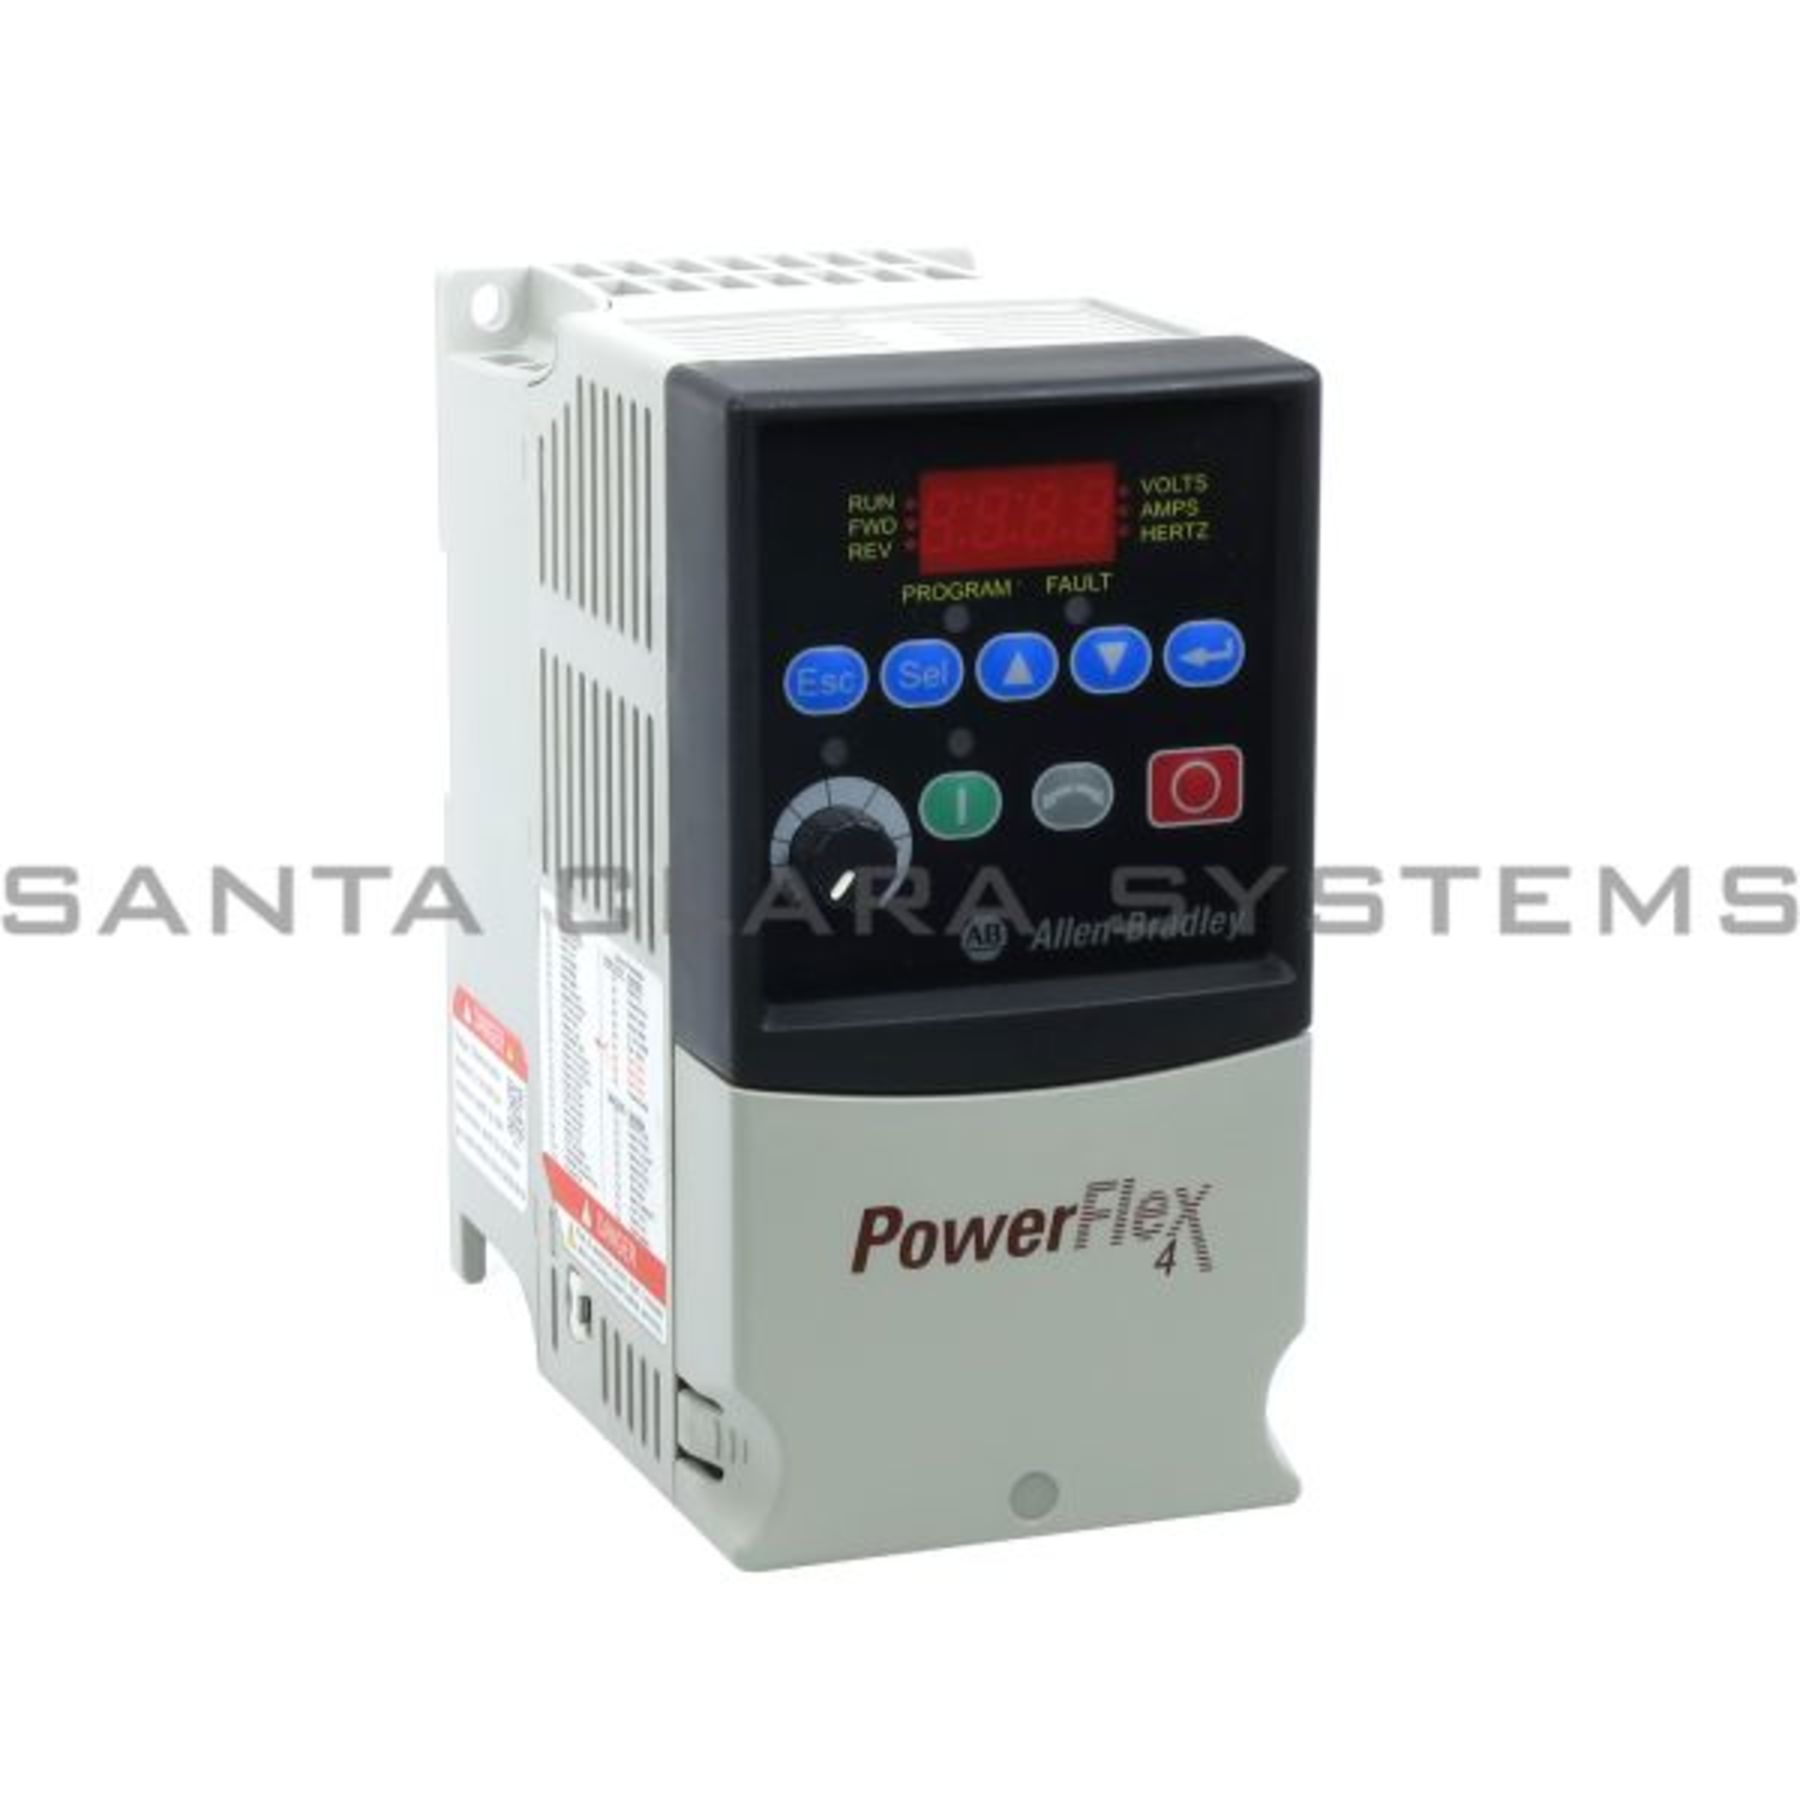 Allen Bradley 22A-V2P3N104 PowerFlex 4 AC Drive Product Image